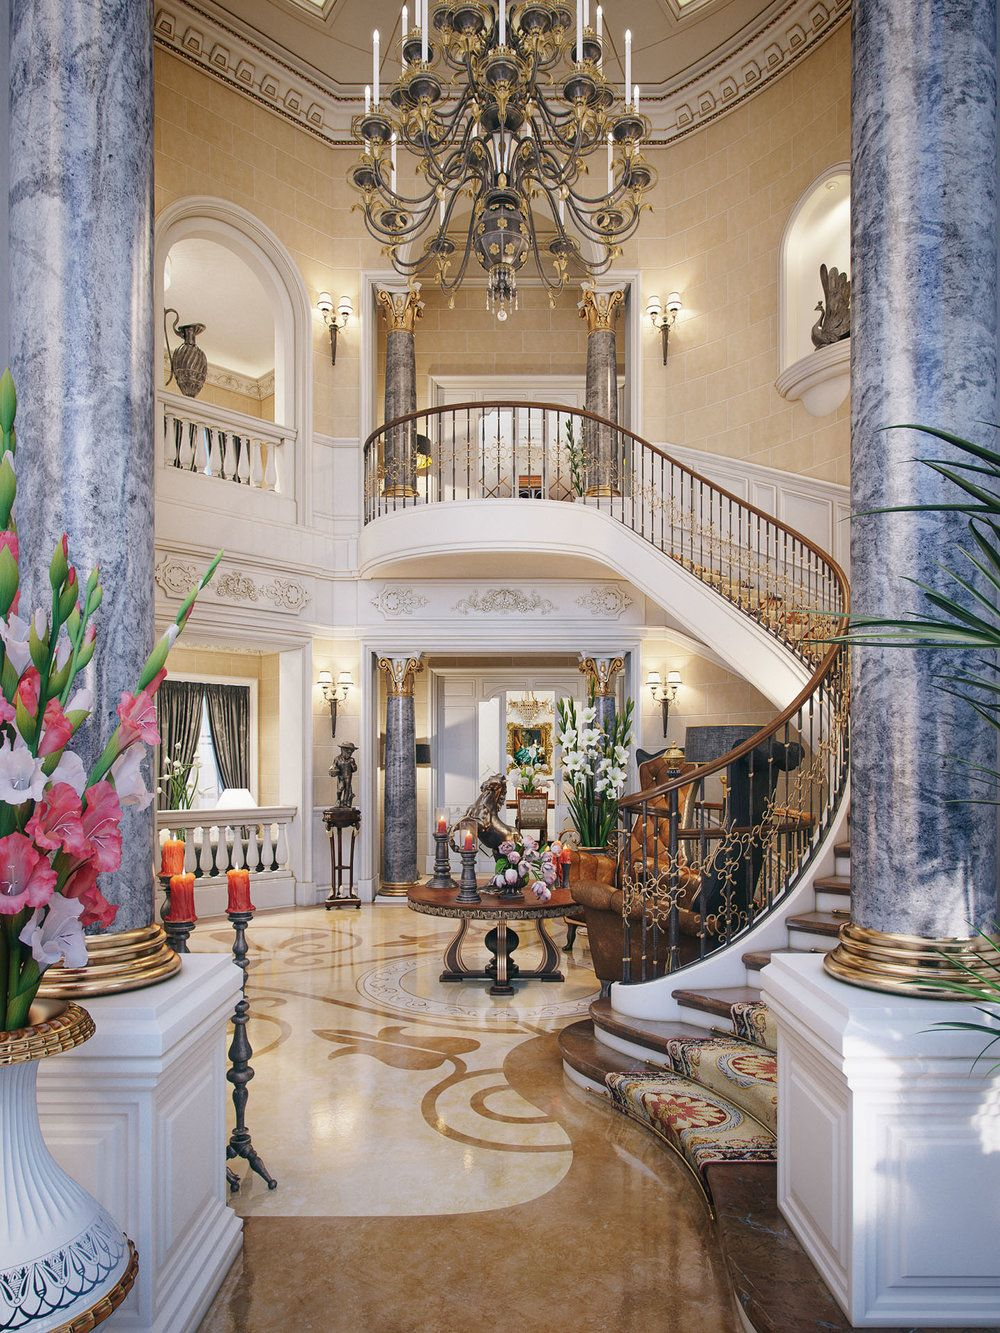 Taher Design Luxury Villa Interior Qatar (4).jpg Not a fan of the ...